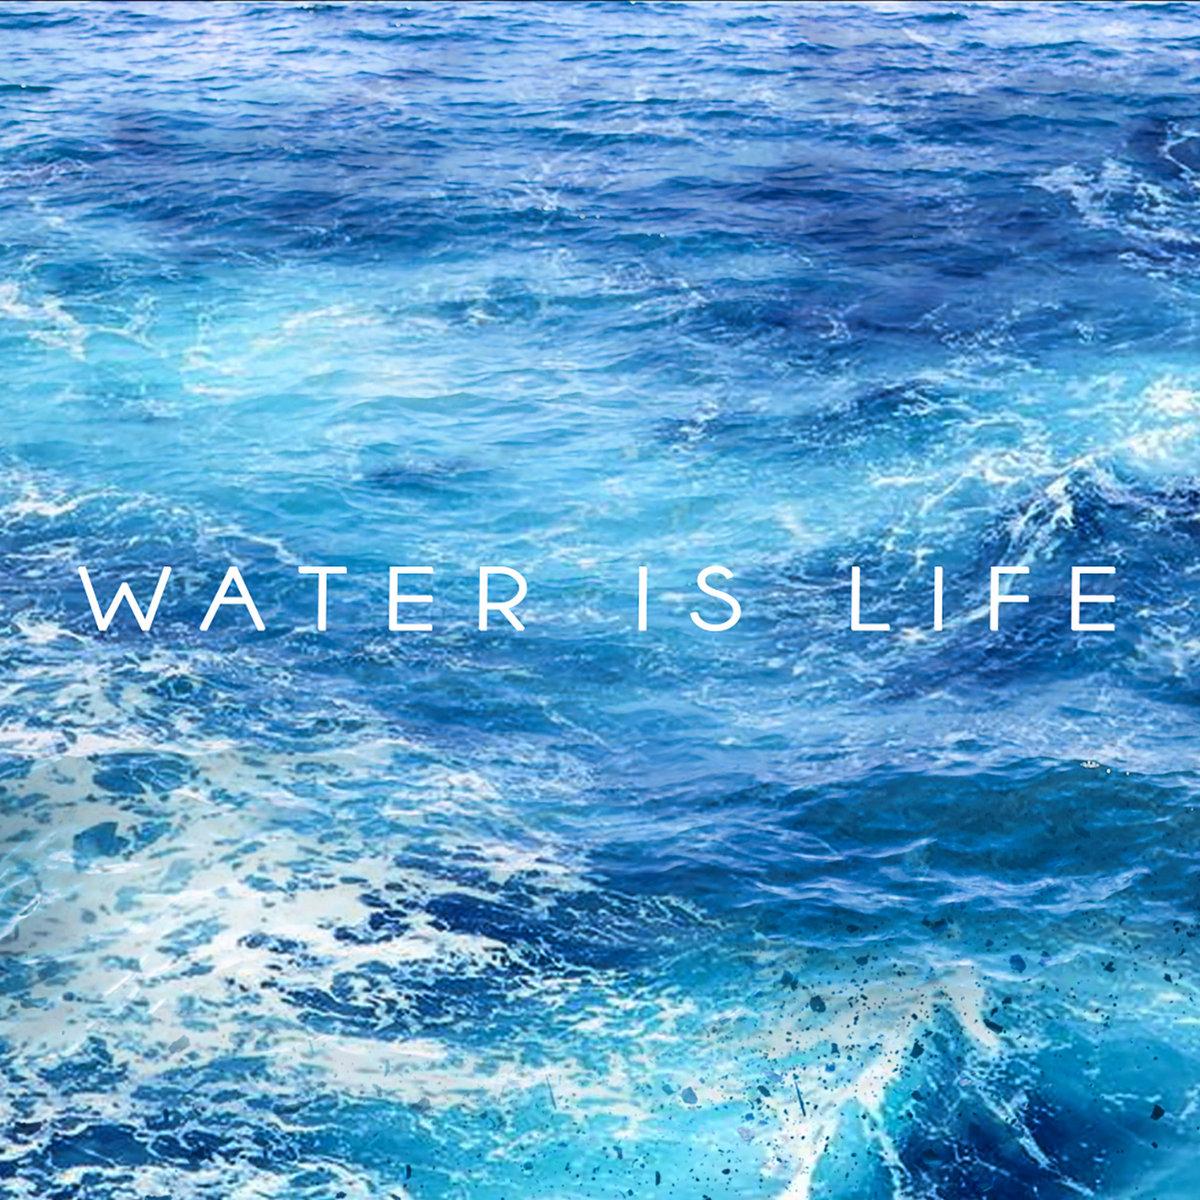 WATER IS LIFE Dustin Thomas